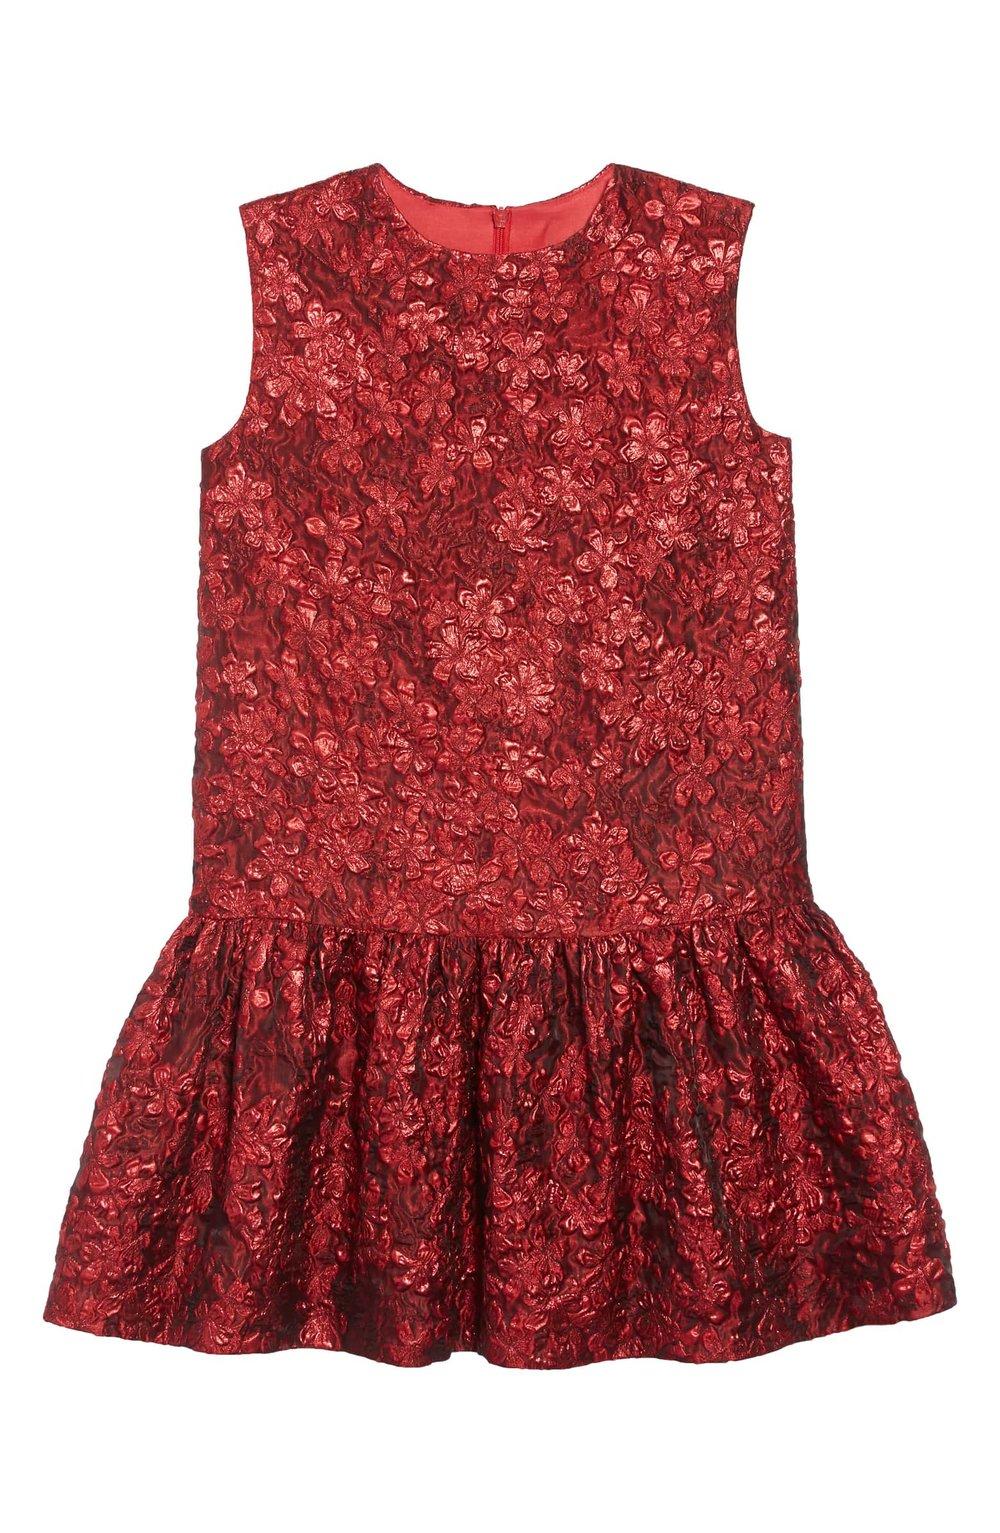 OSCAR DE LA RENTA Metallic Flower Jacquard Drop Waist Dress | Nordstrom